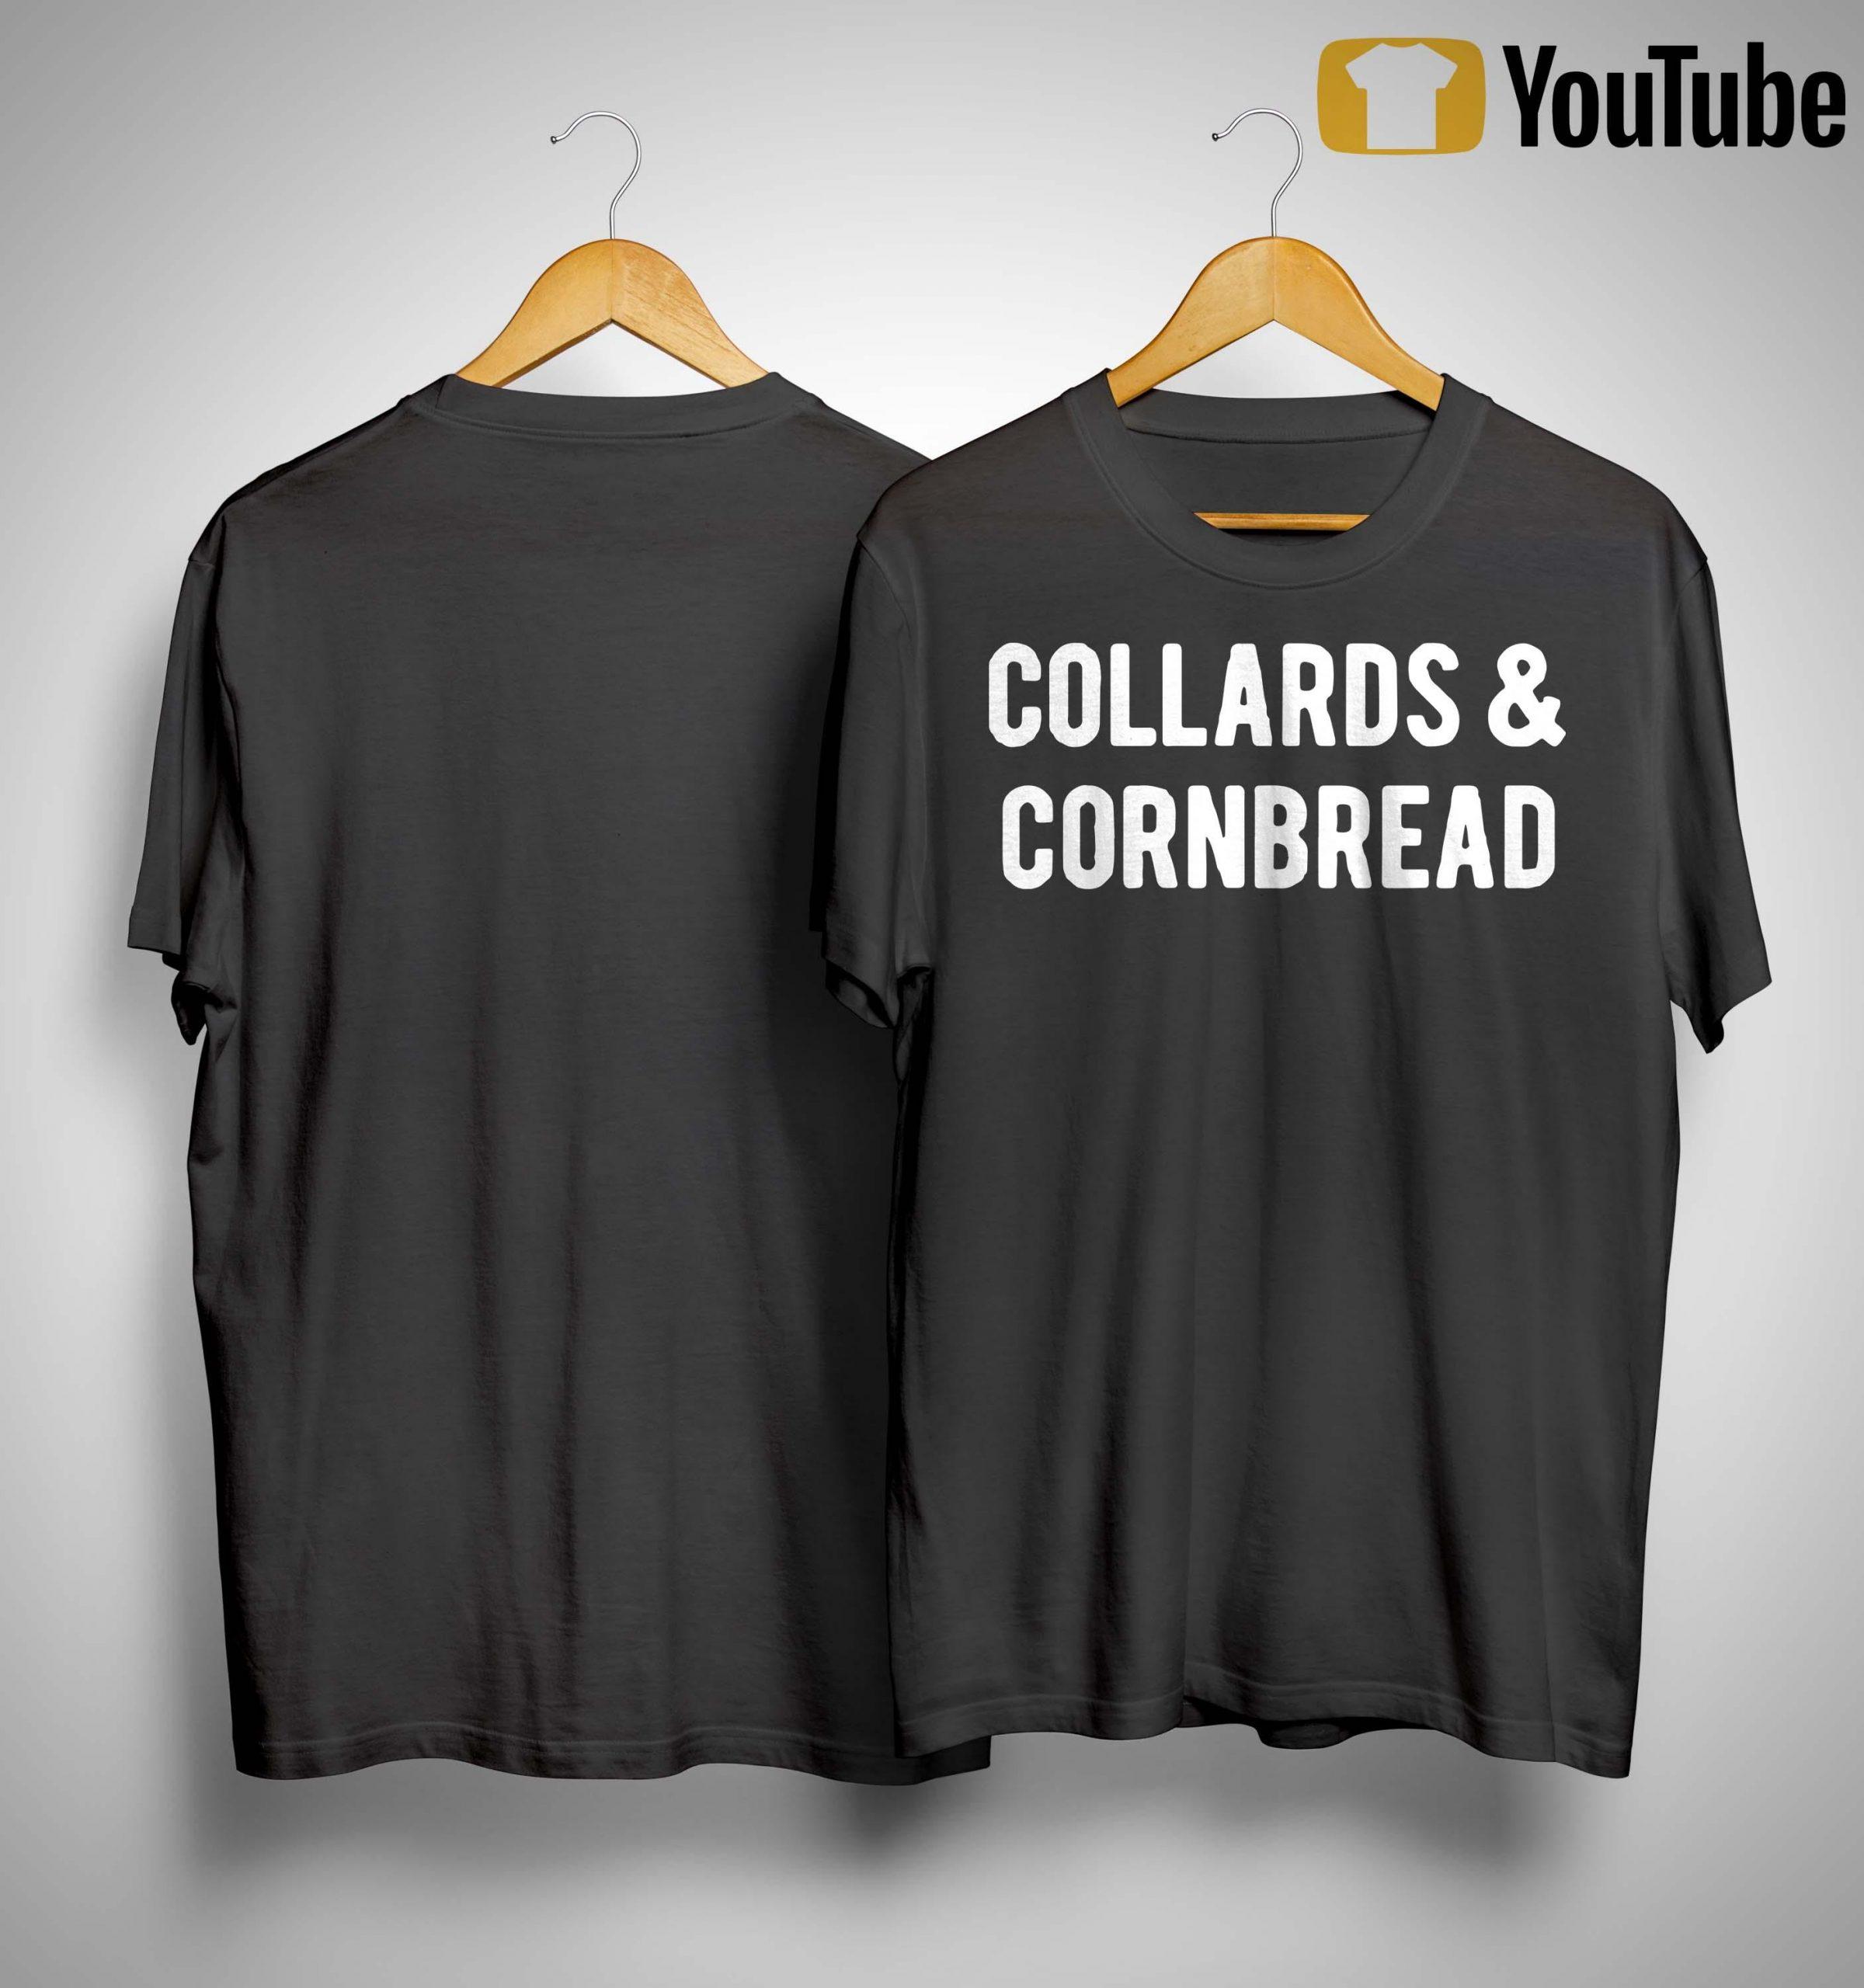 Collards And Cornbread Shirt